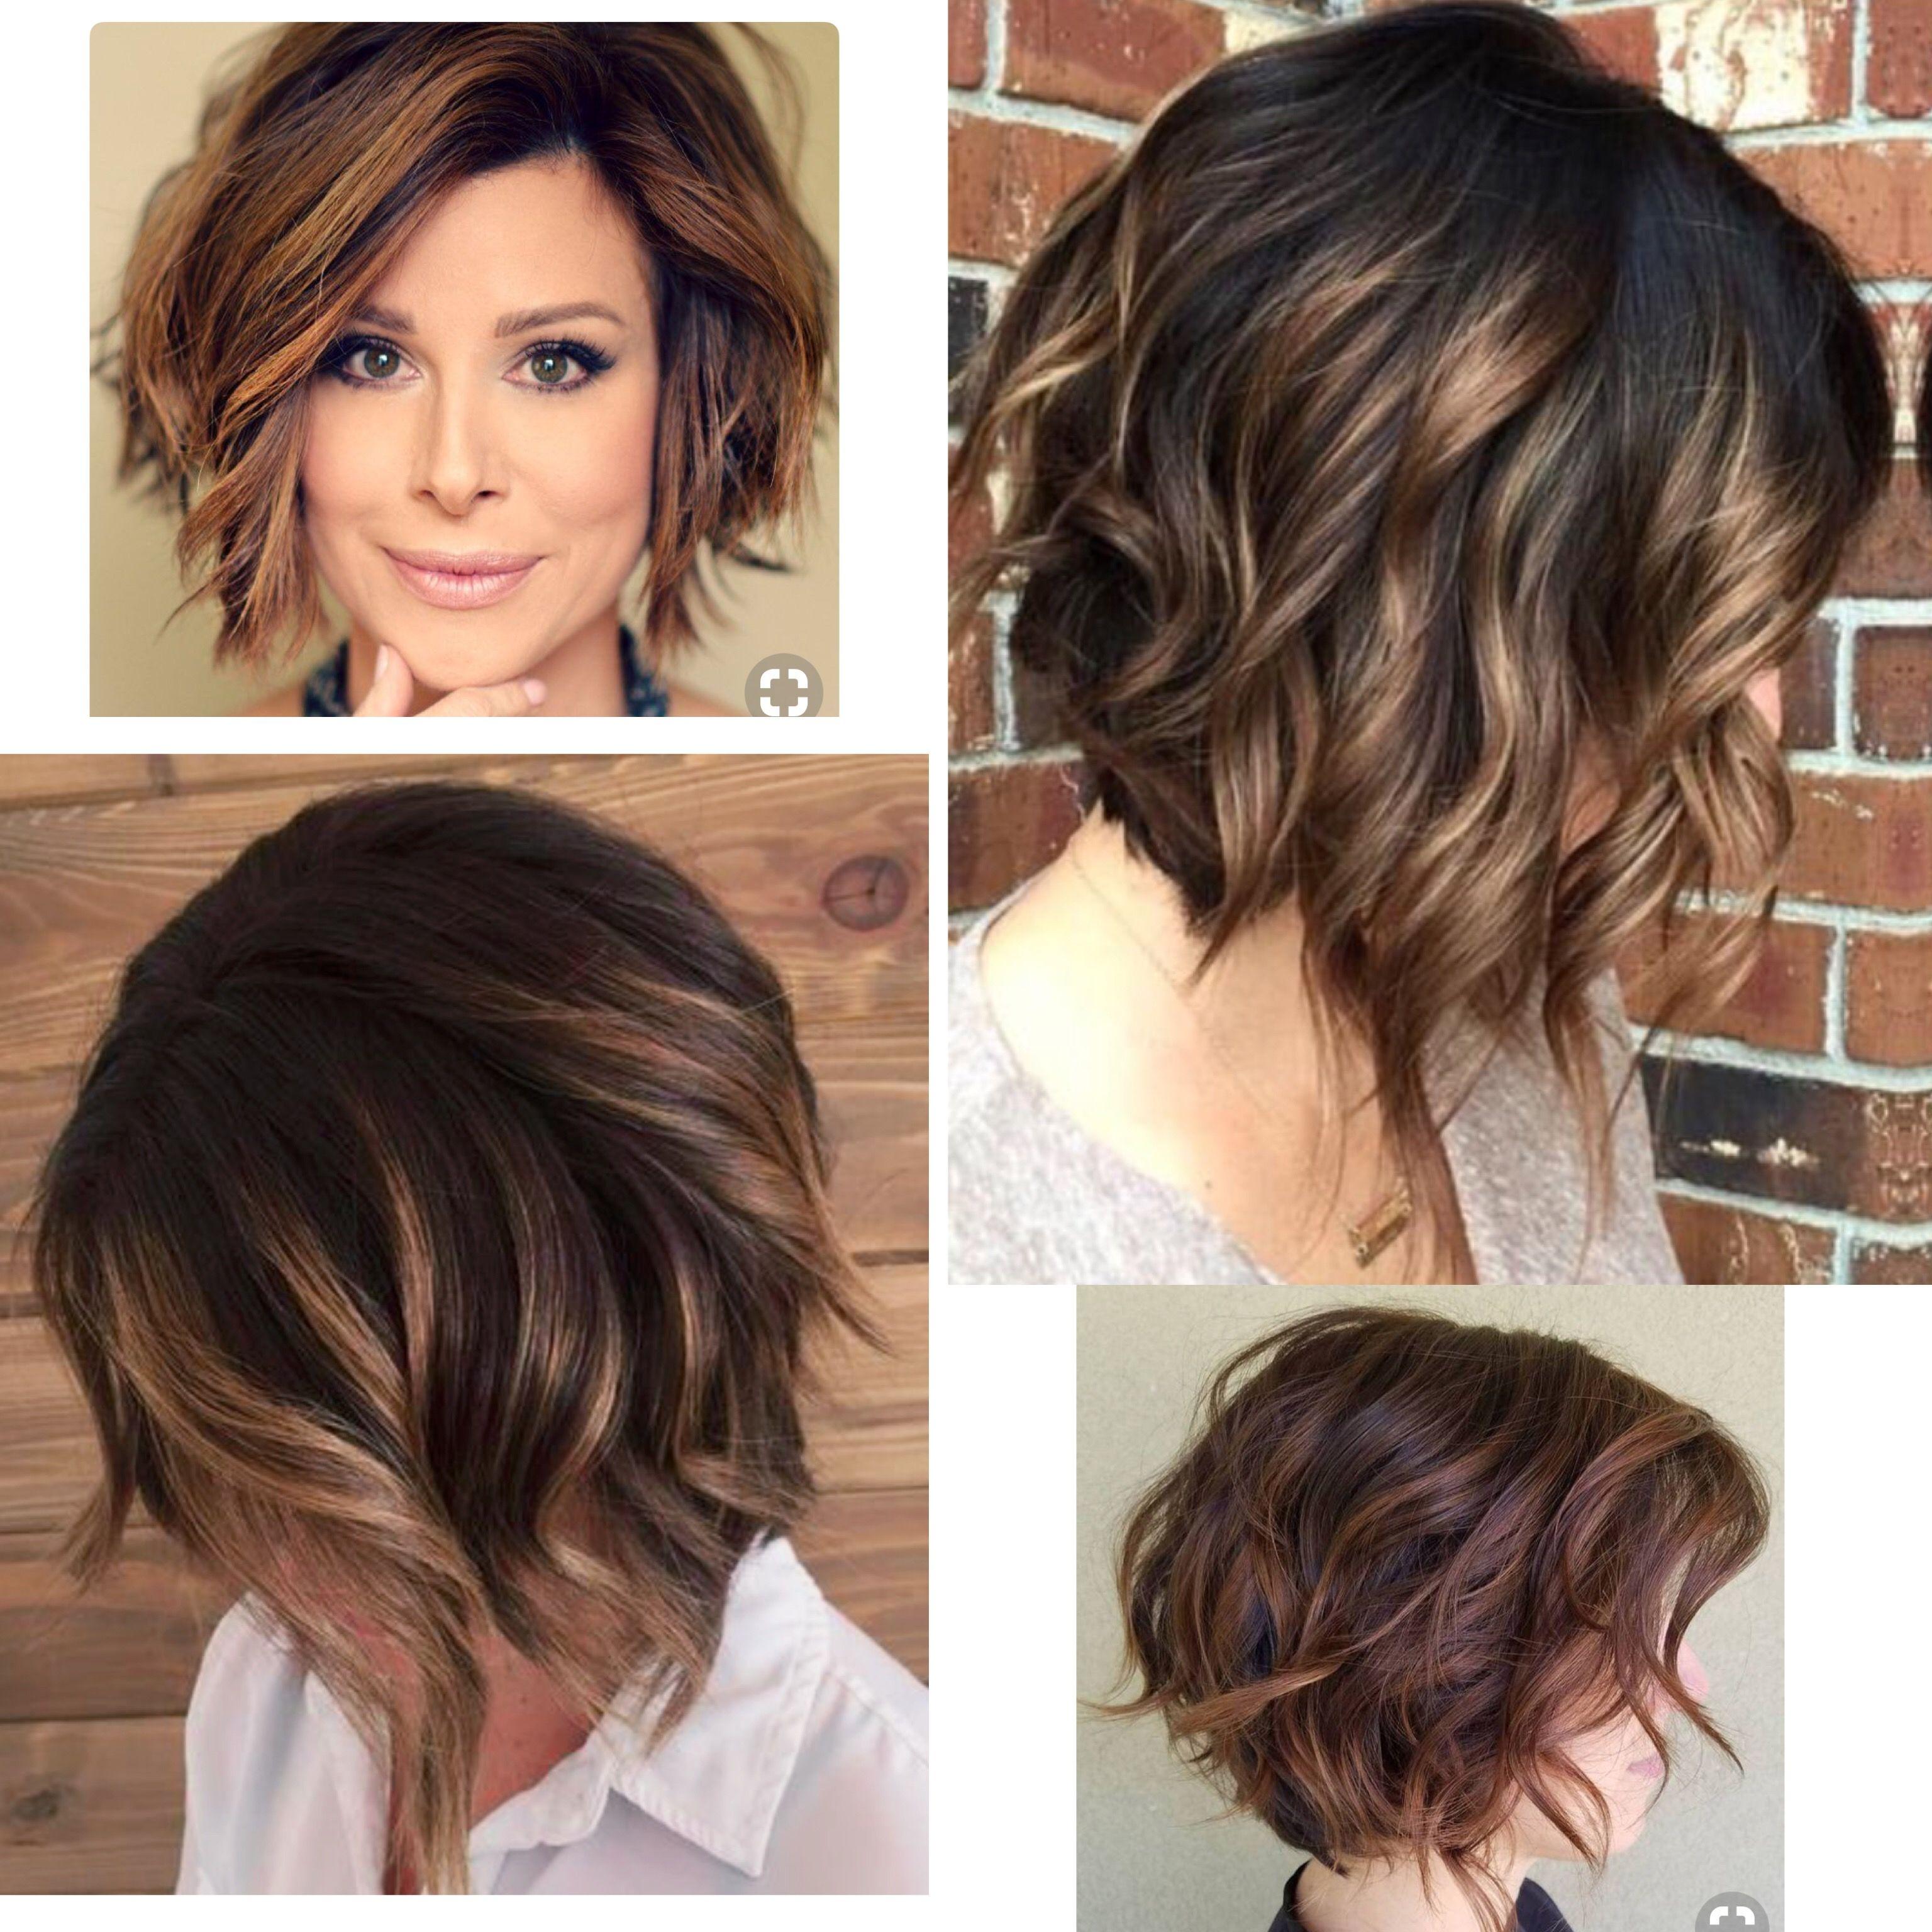 Pin by Sandy Batista on penteados  Pinterest  Hair style Haircuts